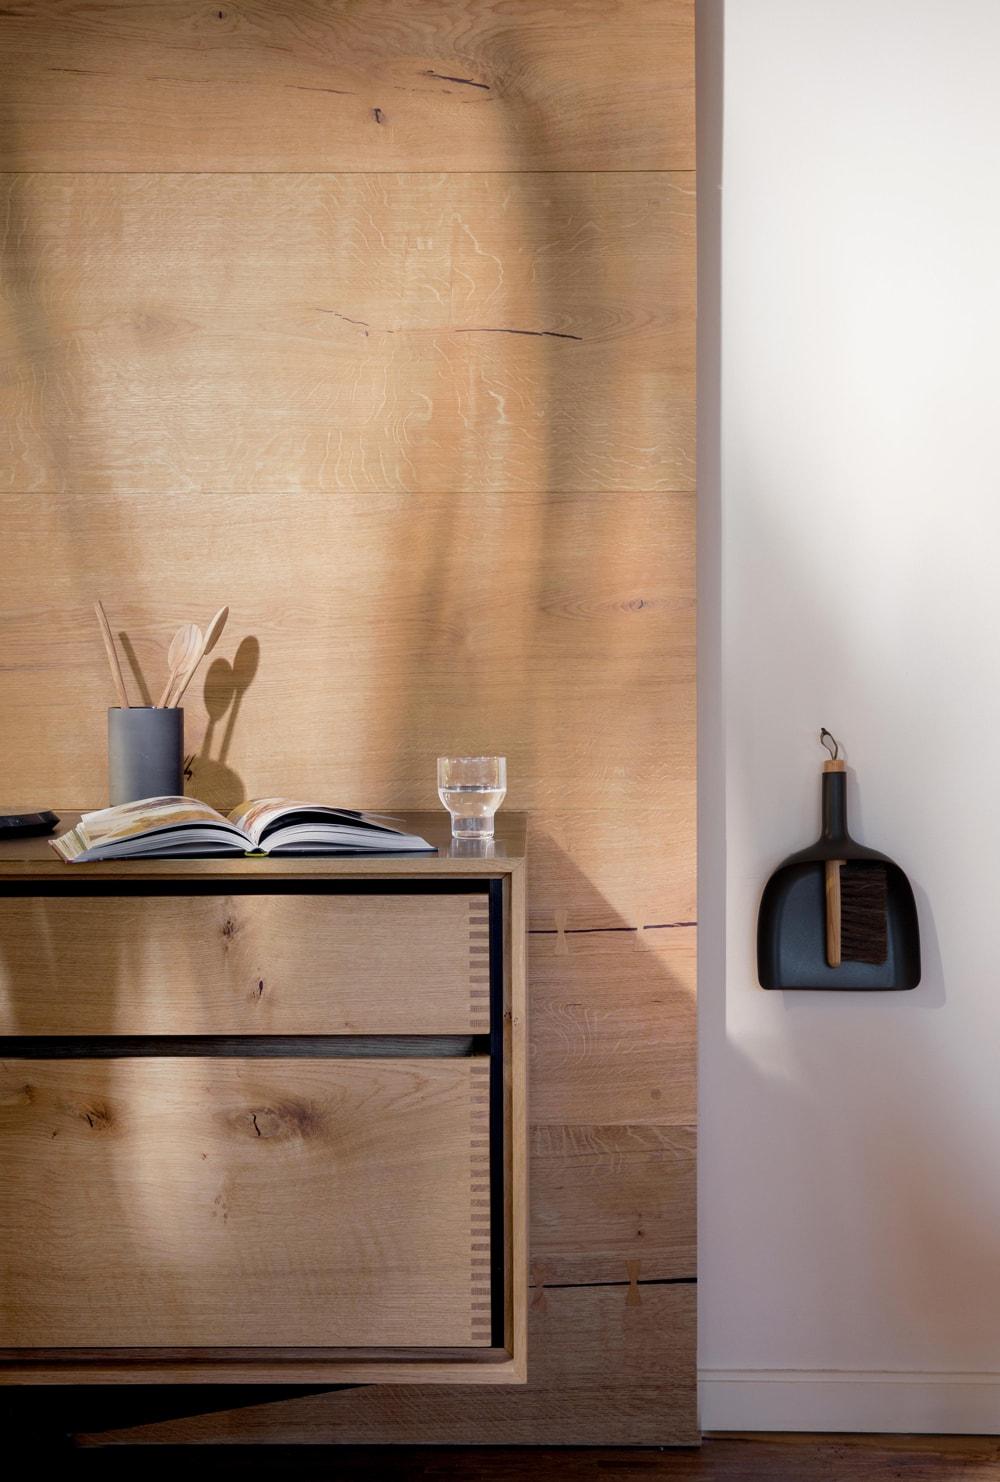 Menu kitchen icons - via Coco Lapine Design